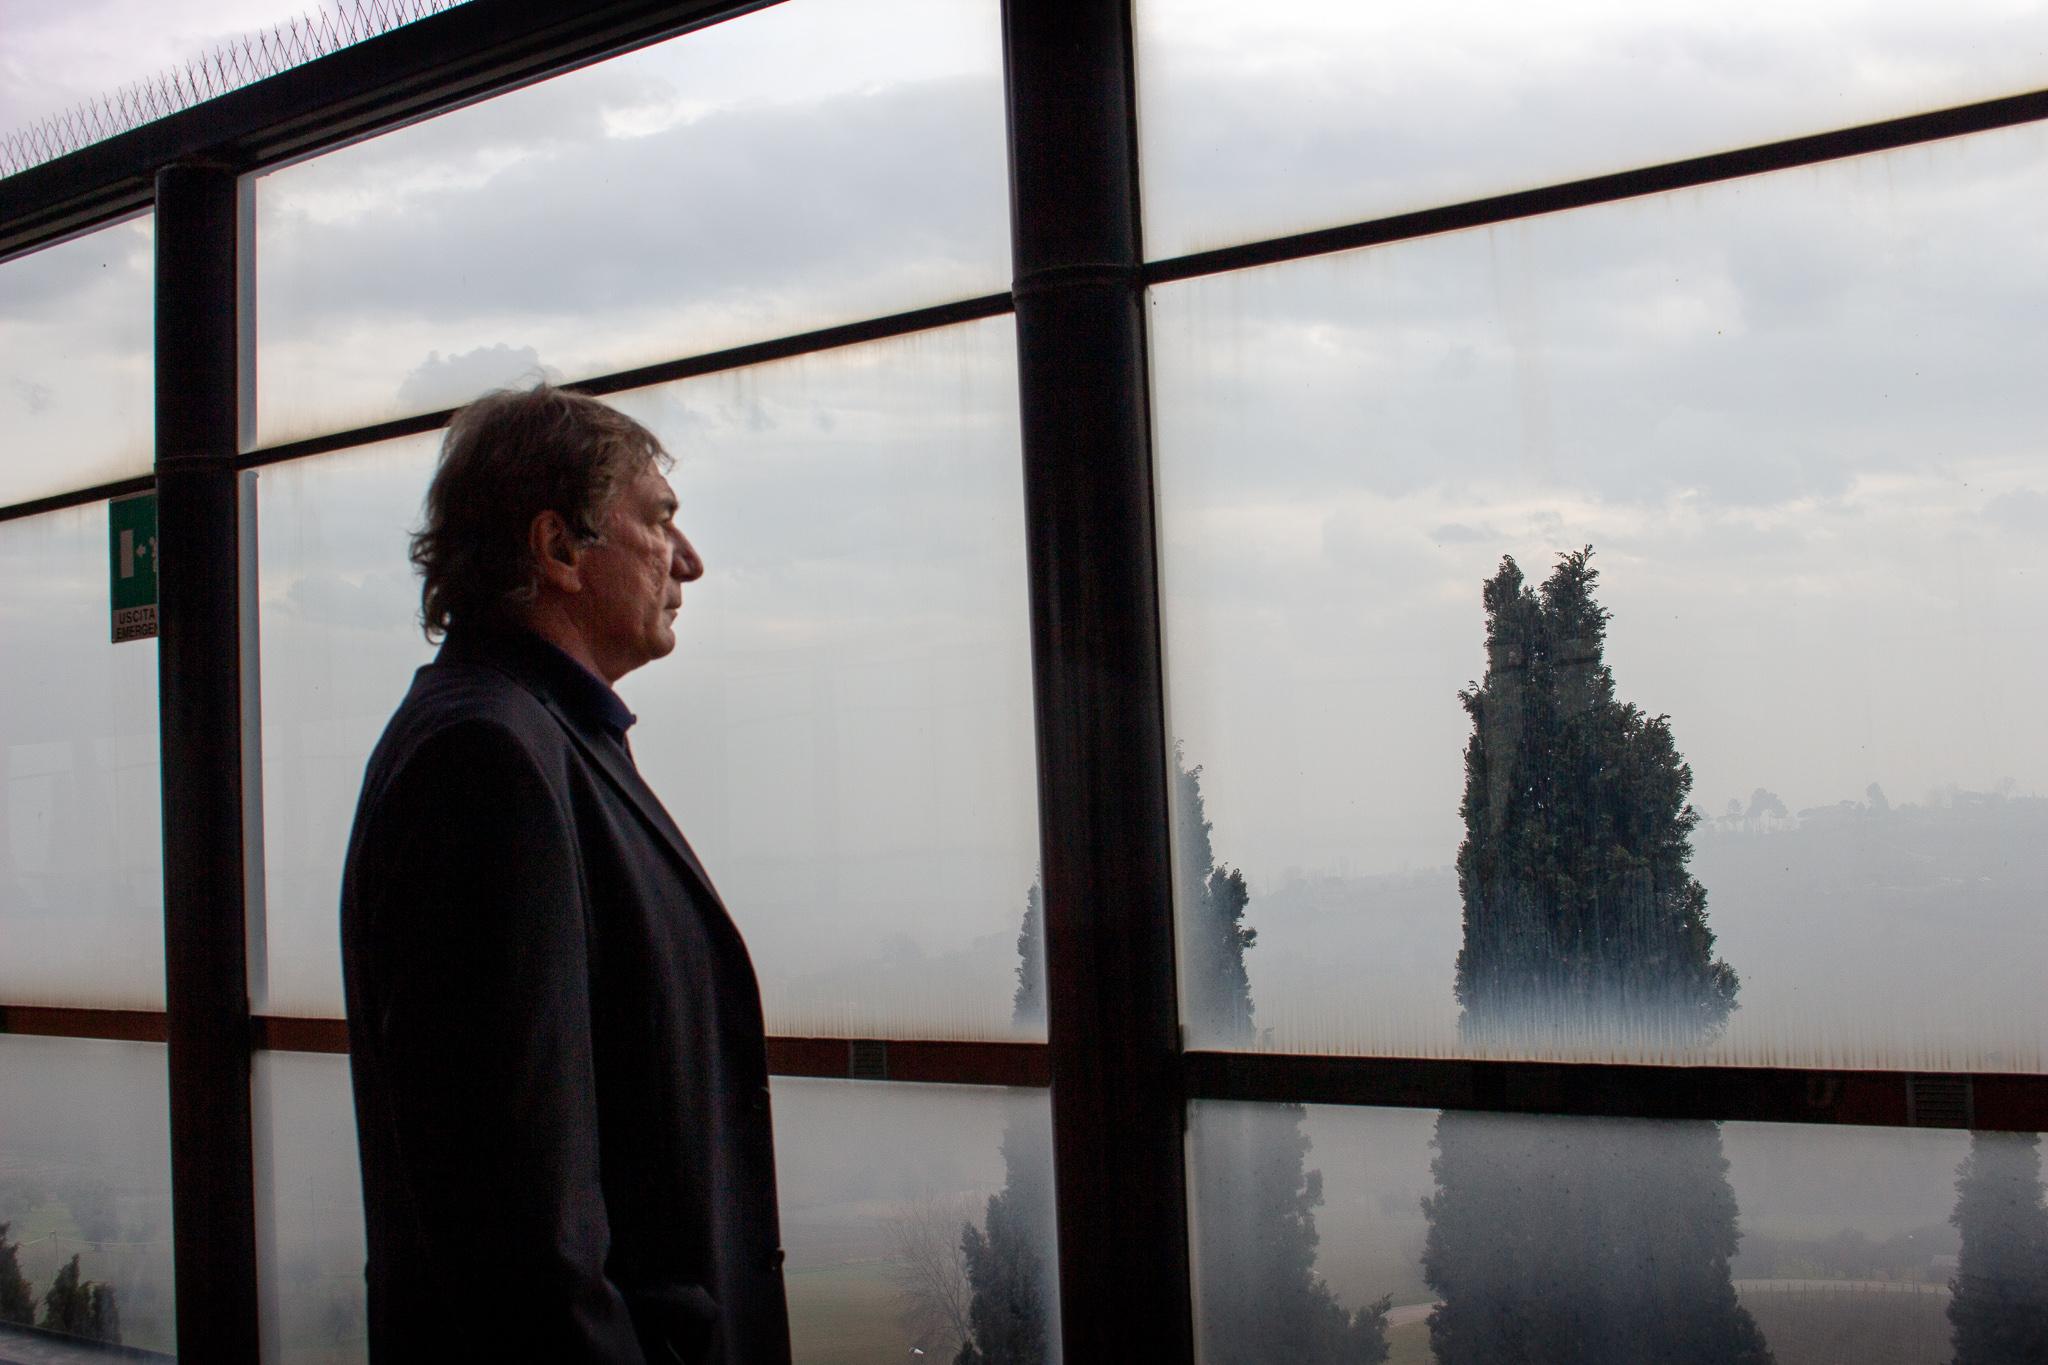 SanPa presidente nebbia-2